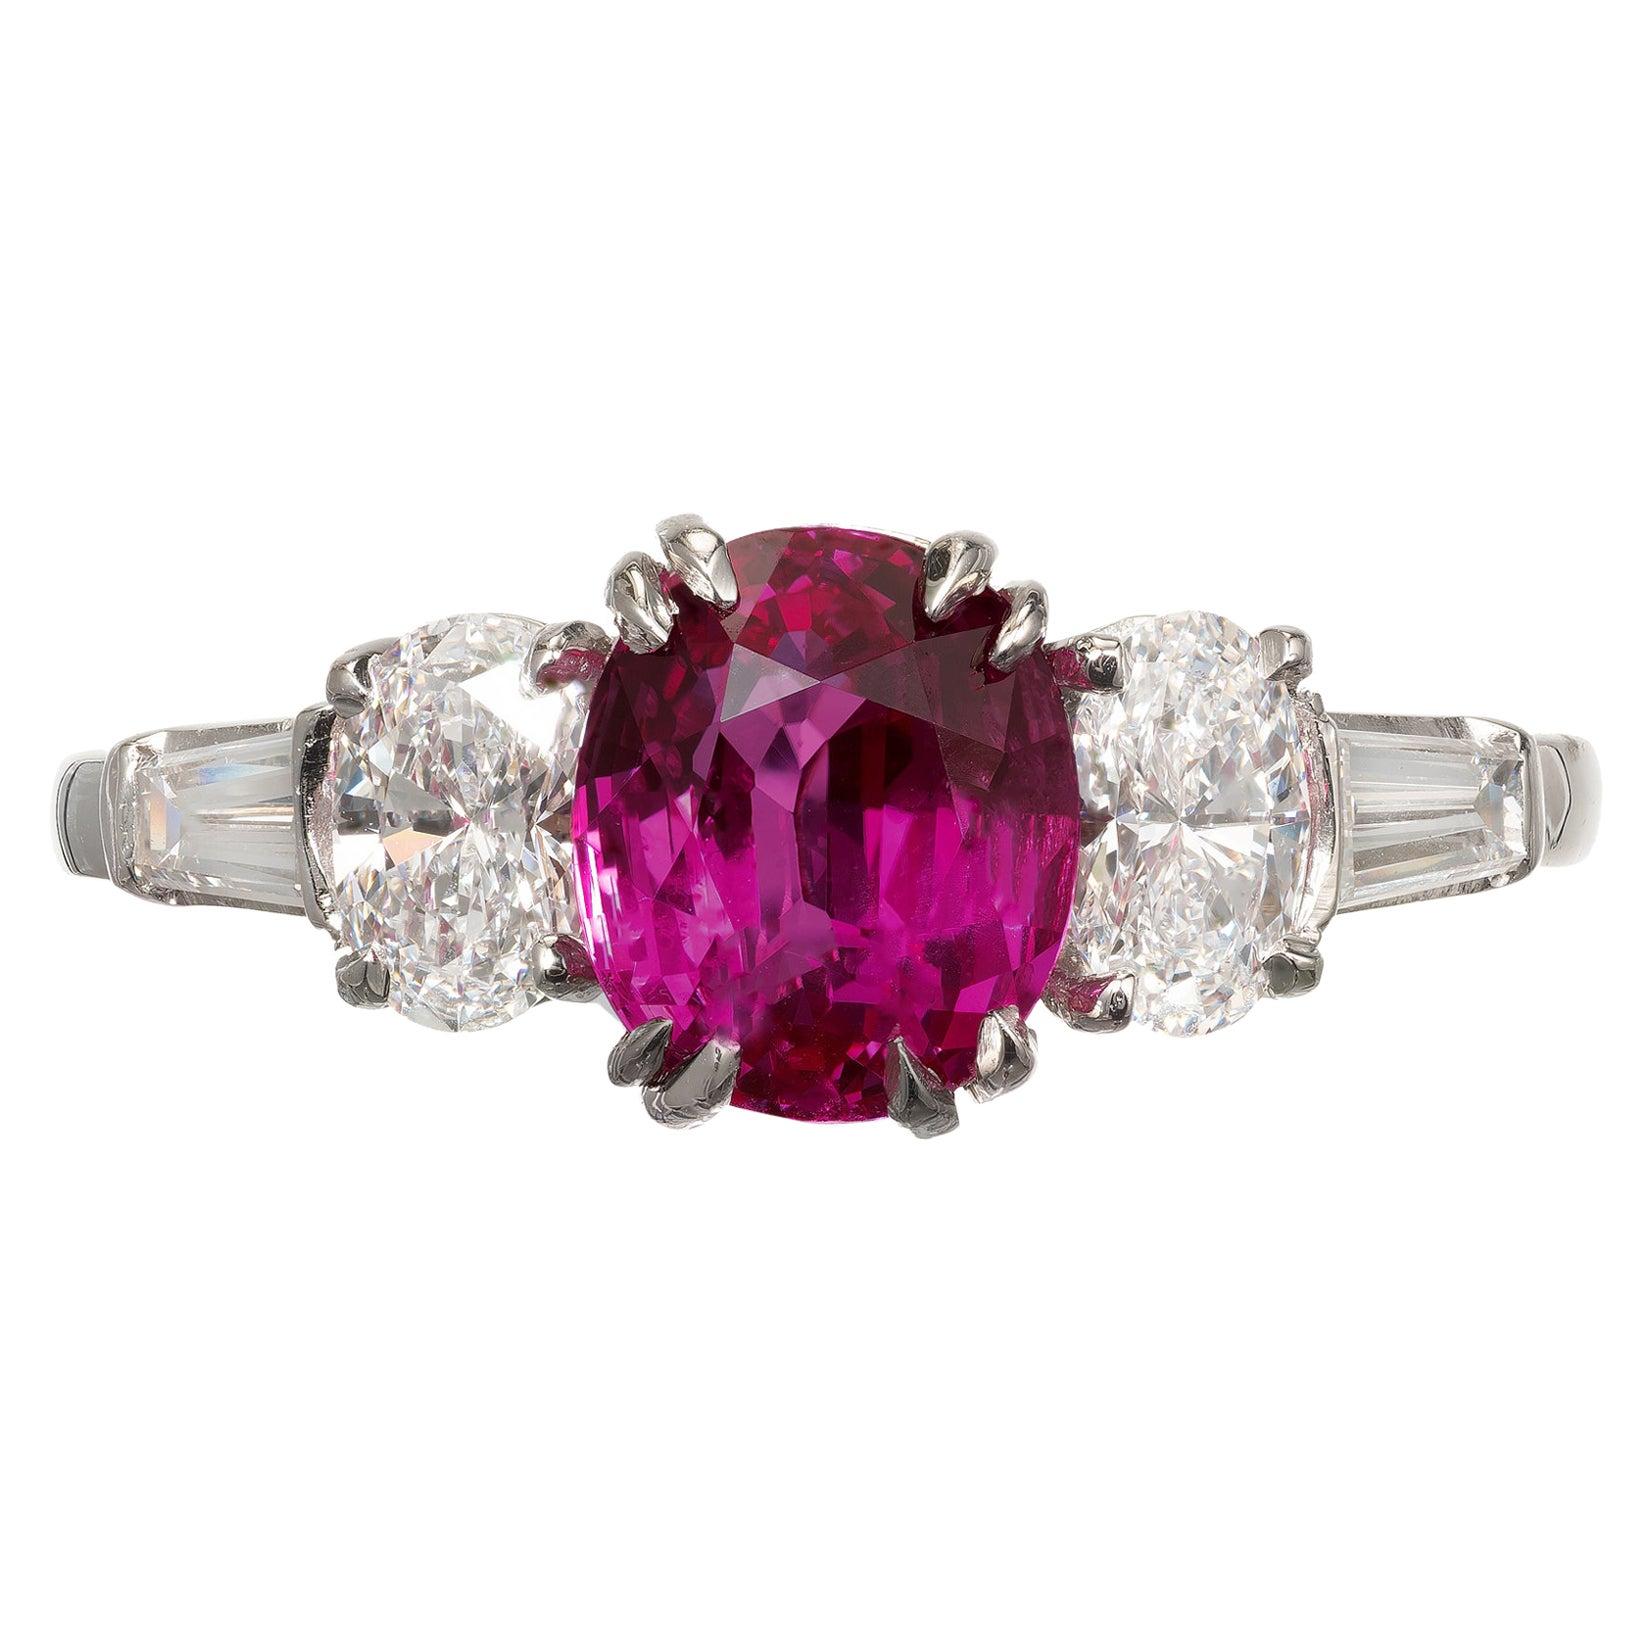 Peter Suchy 2.23 Carat Burma Myanmar Red Ruby Diamond Platinum Engagement Ring